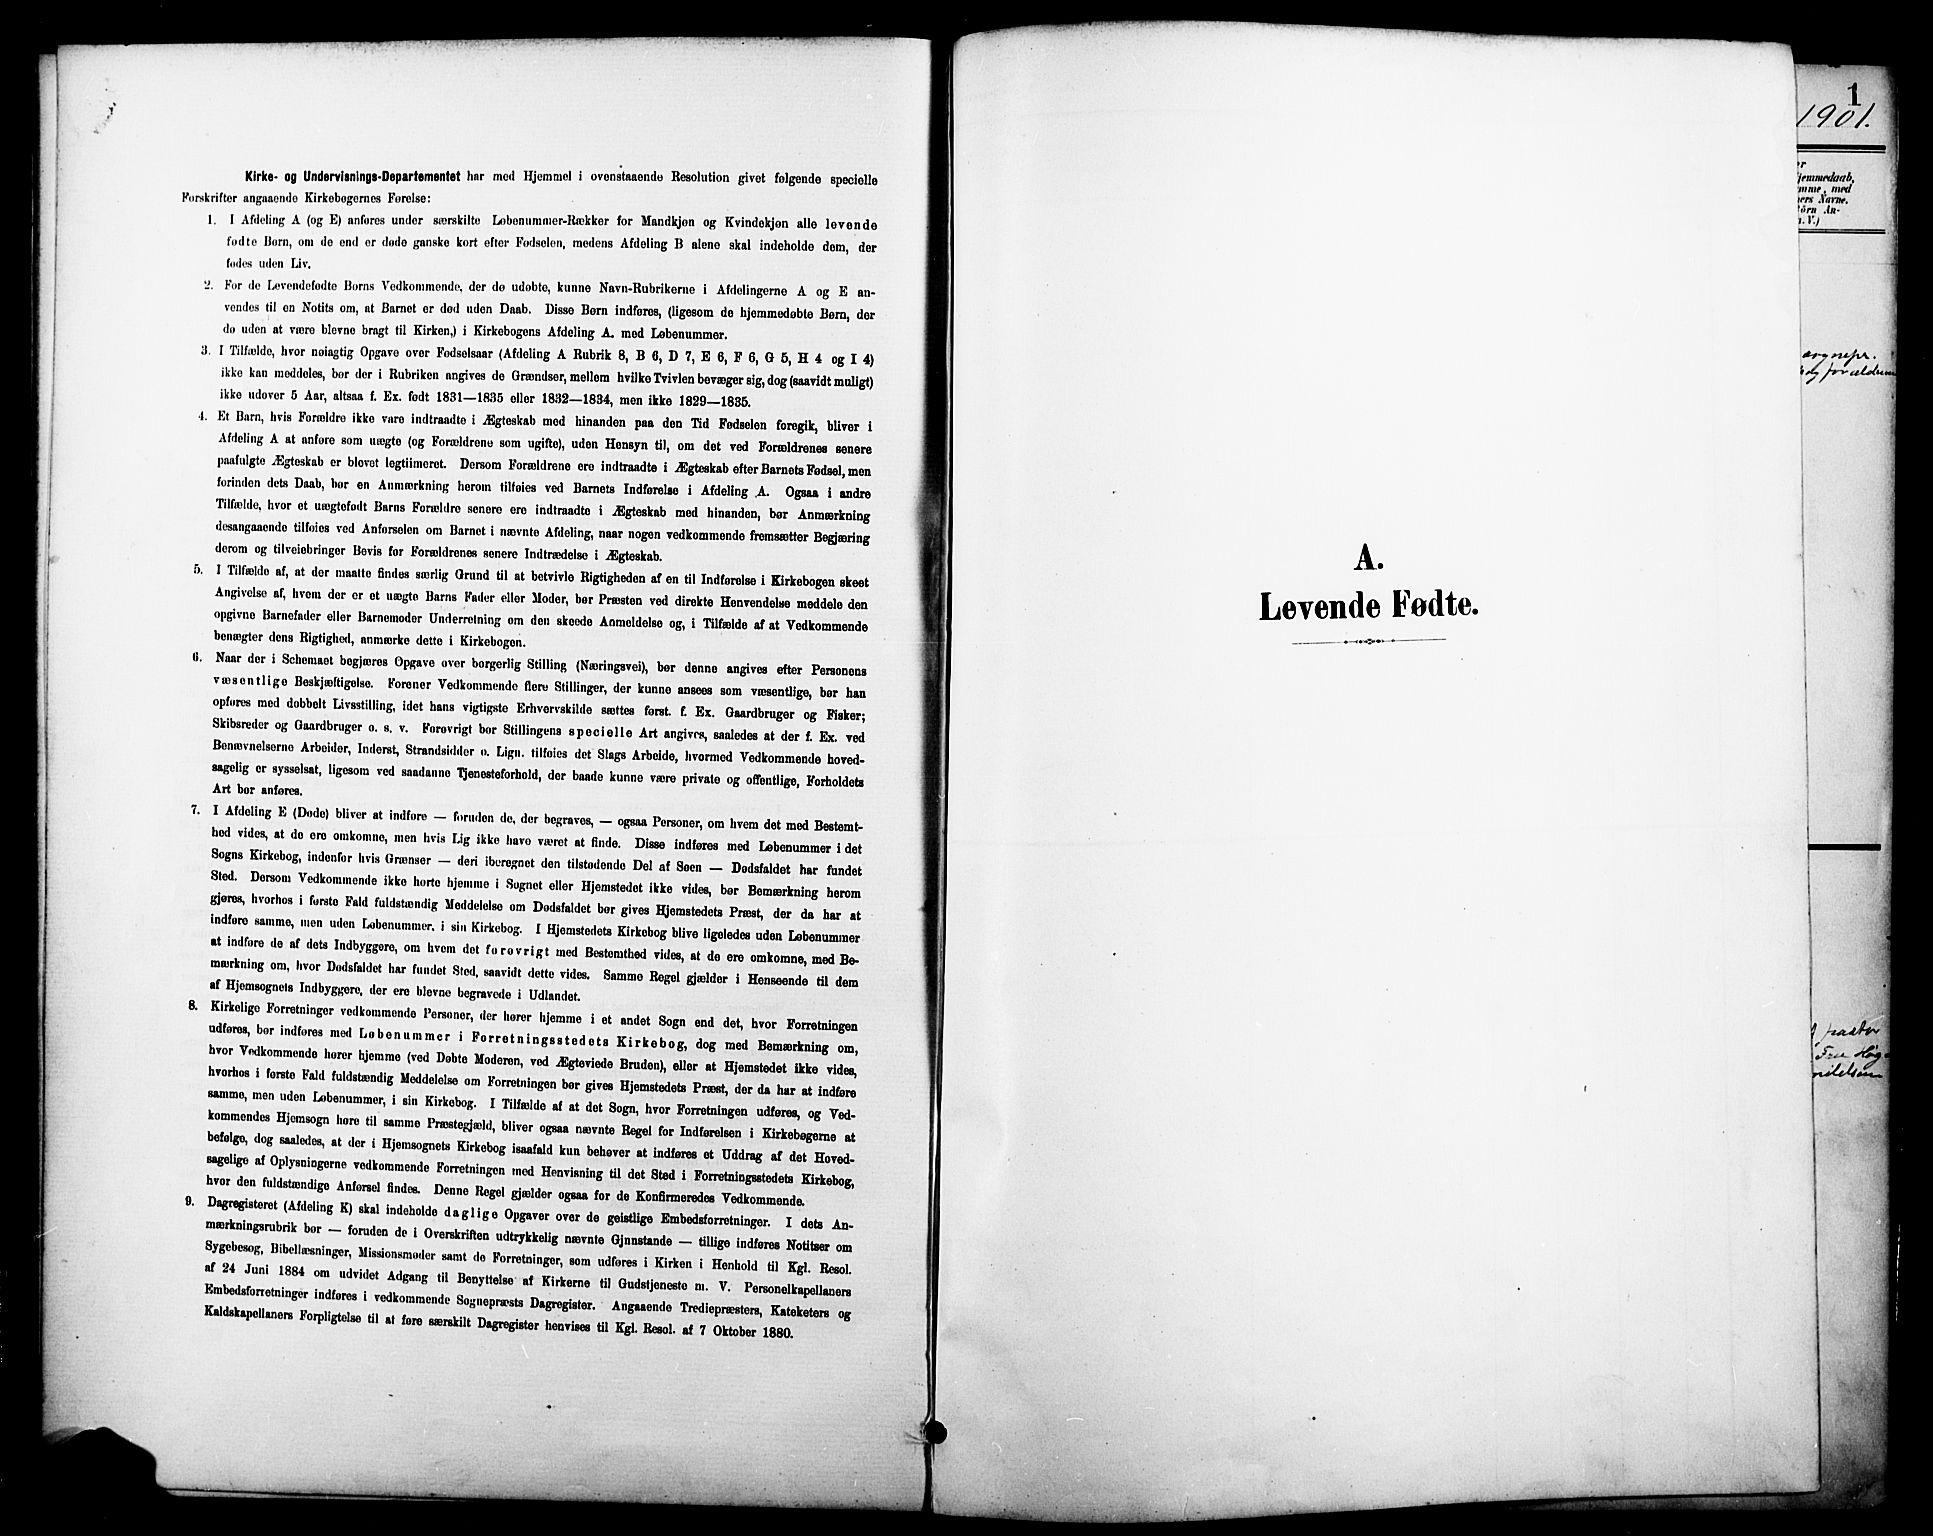 SAKO, Brevik kirkebøker, G/Ga/L0005: Klokkerbok nr. 5, 1901-1924